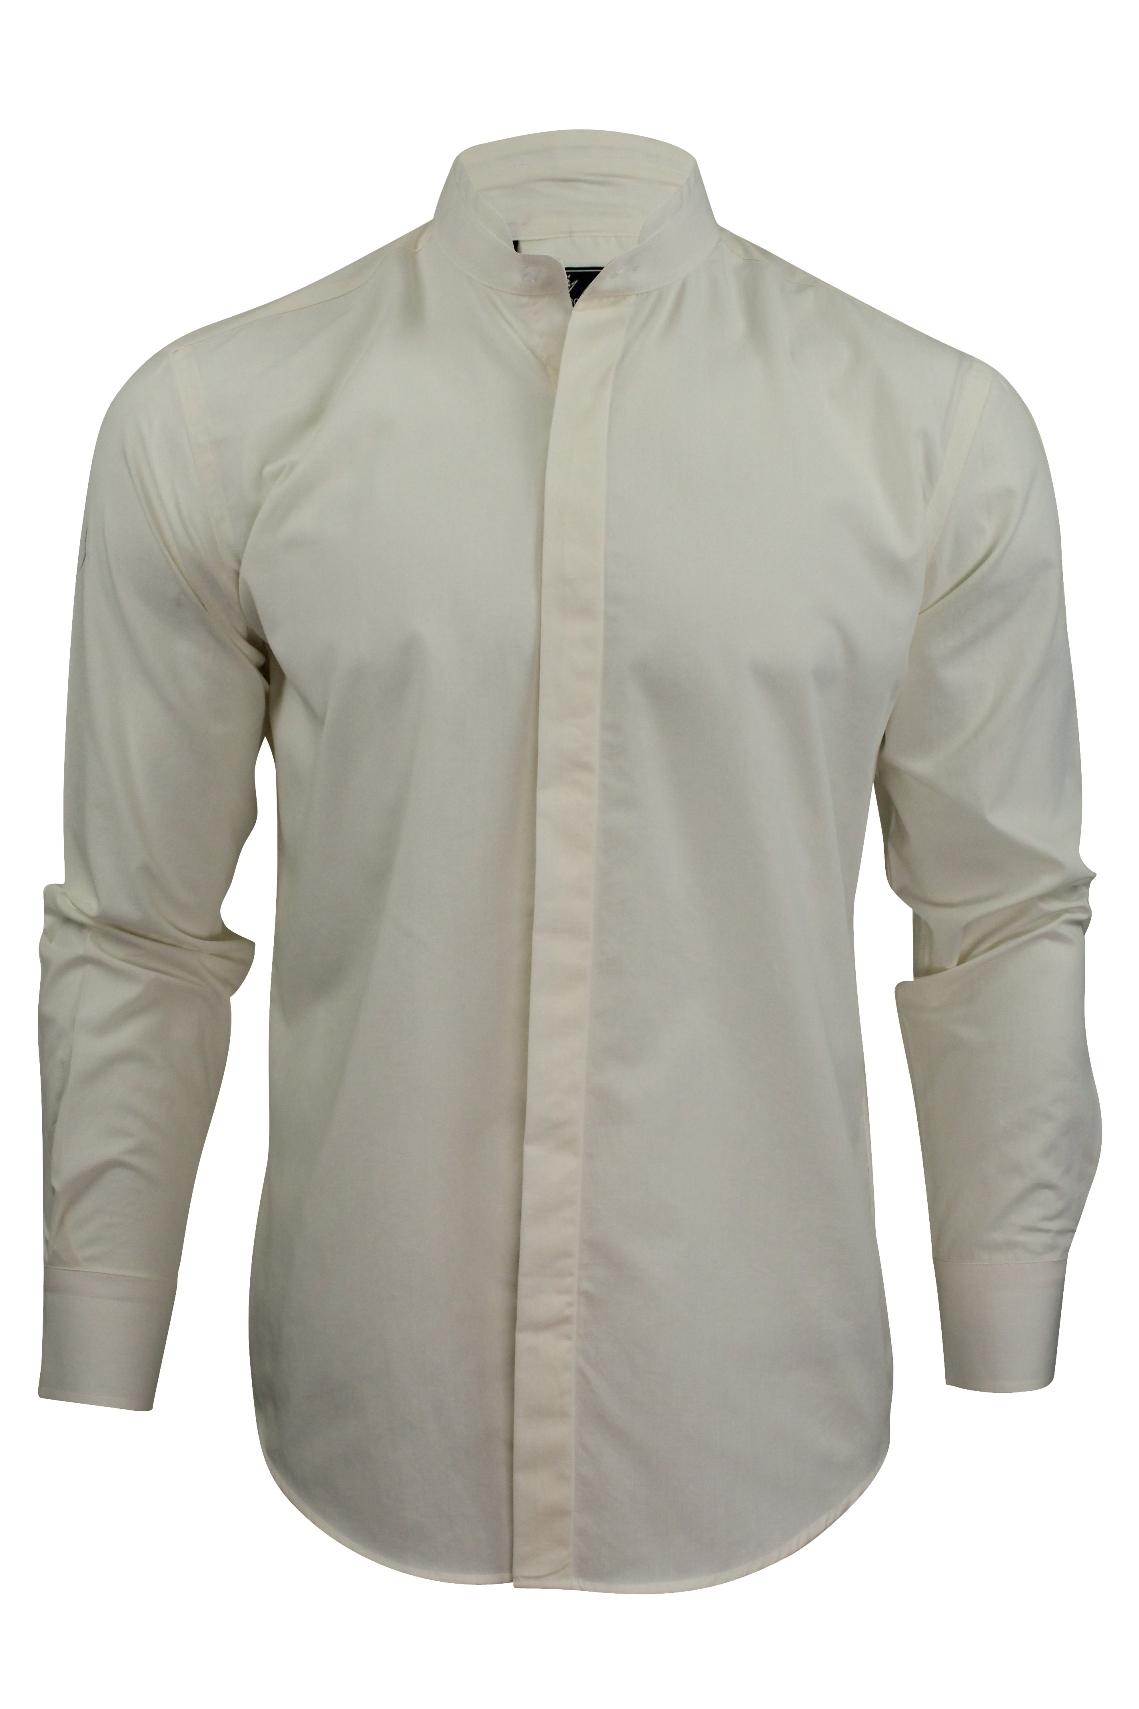 Mens grandad collar shirt by daniel rosso long sleeved ebay Mens grandad collar shirt